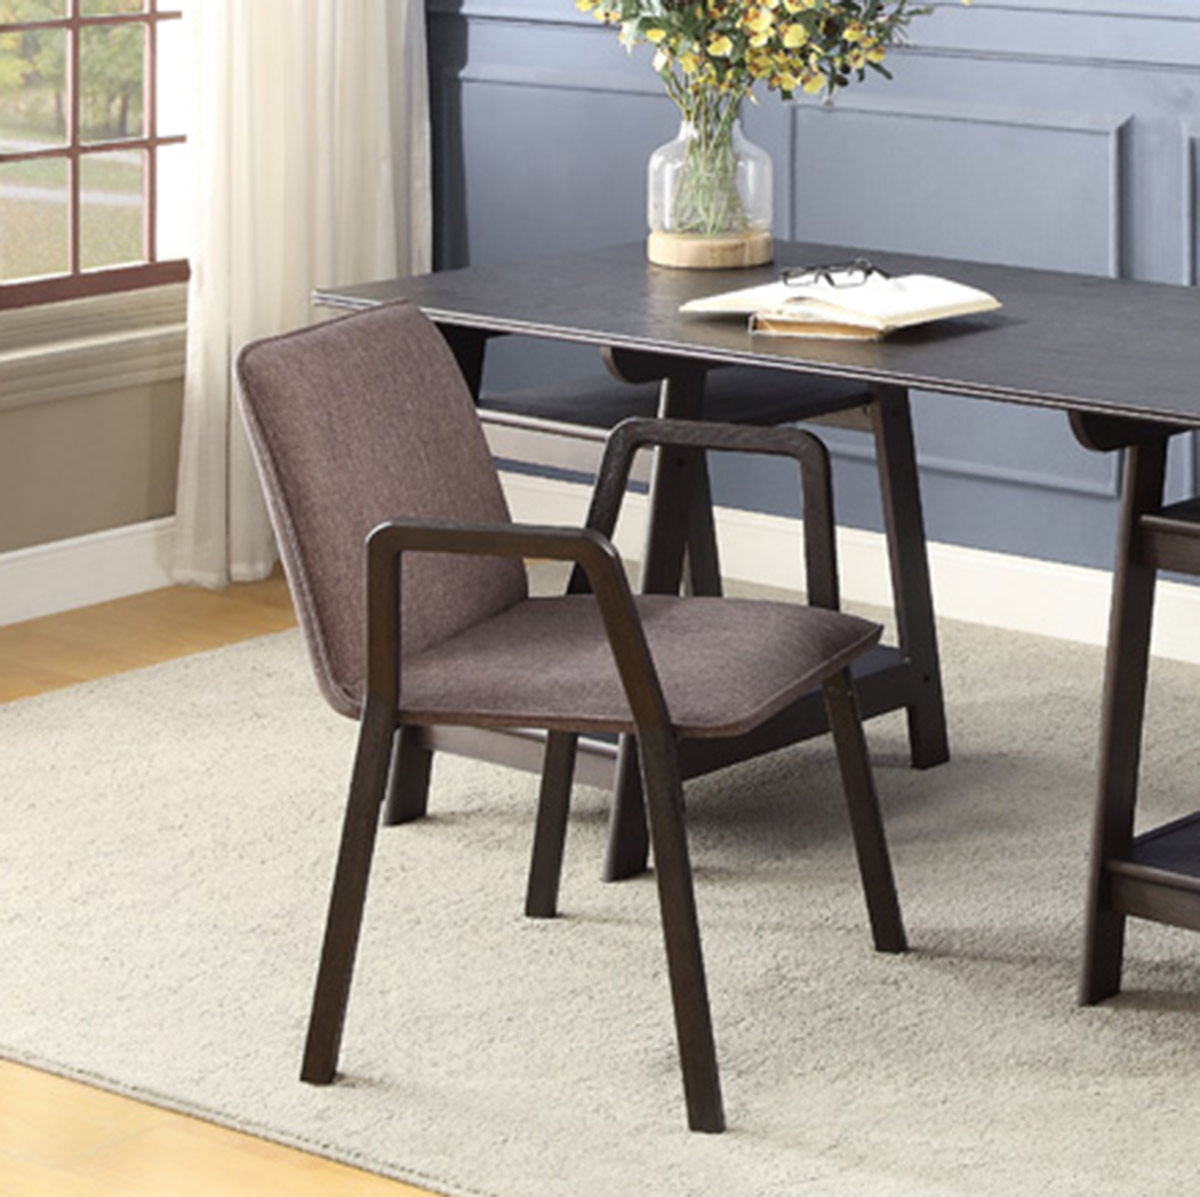 Homelegance Hilles Chair - Dark Charcoal